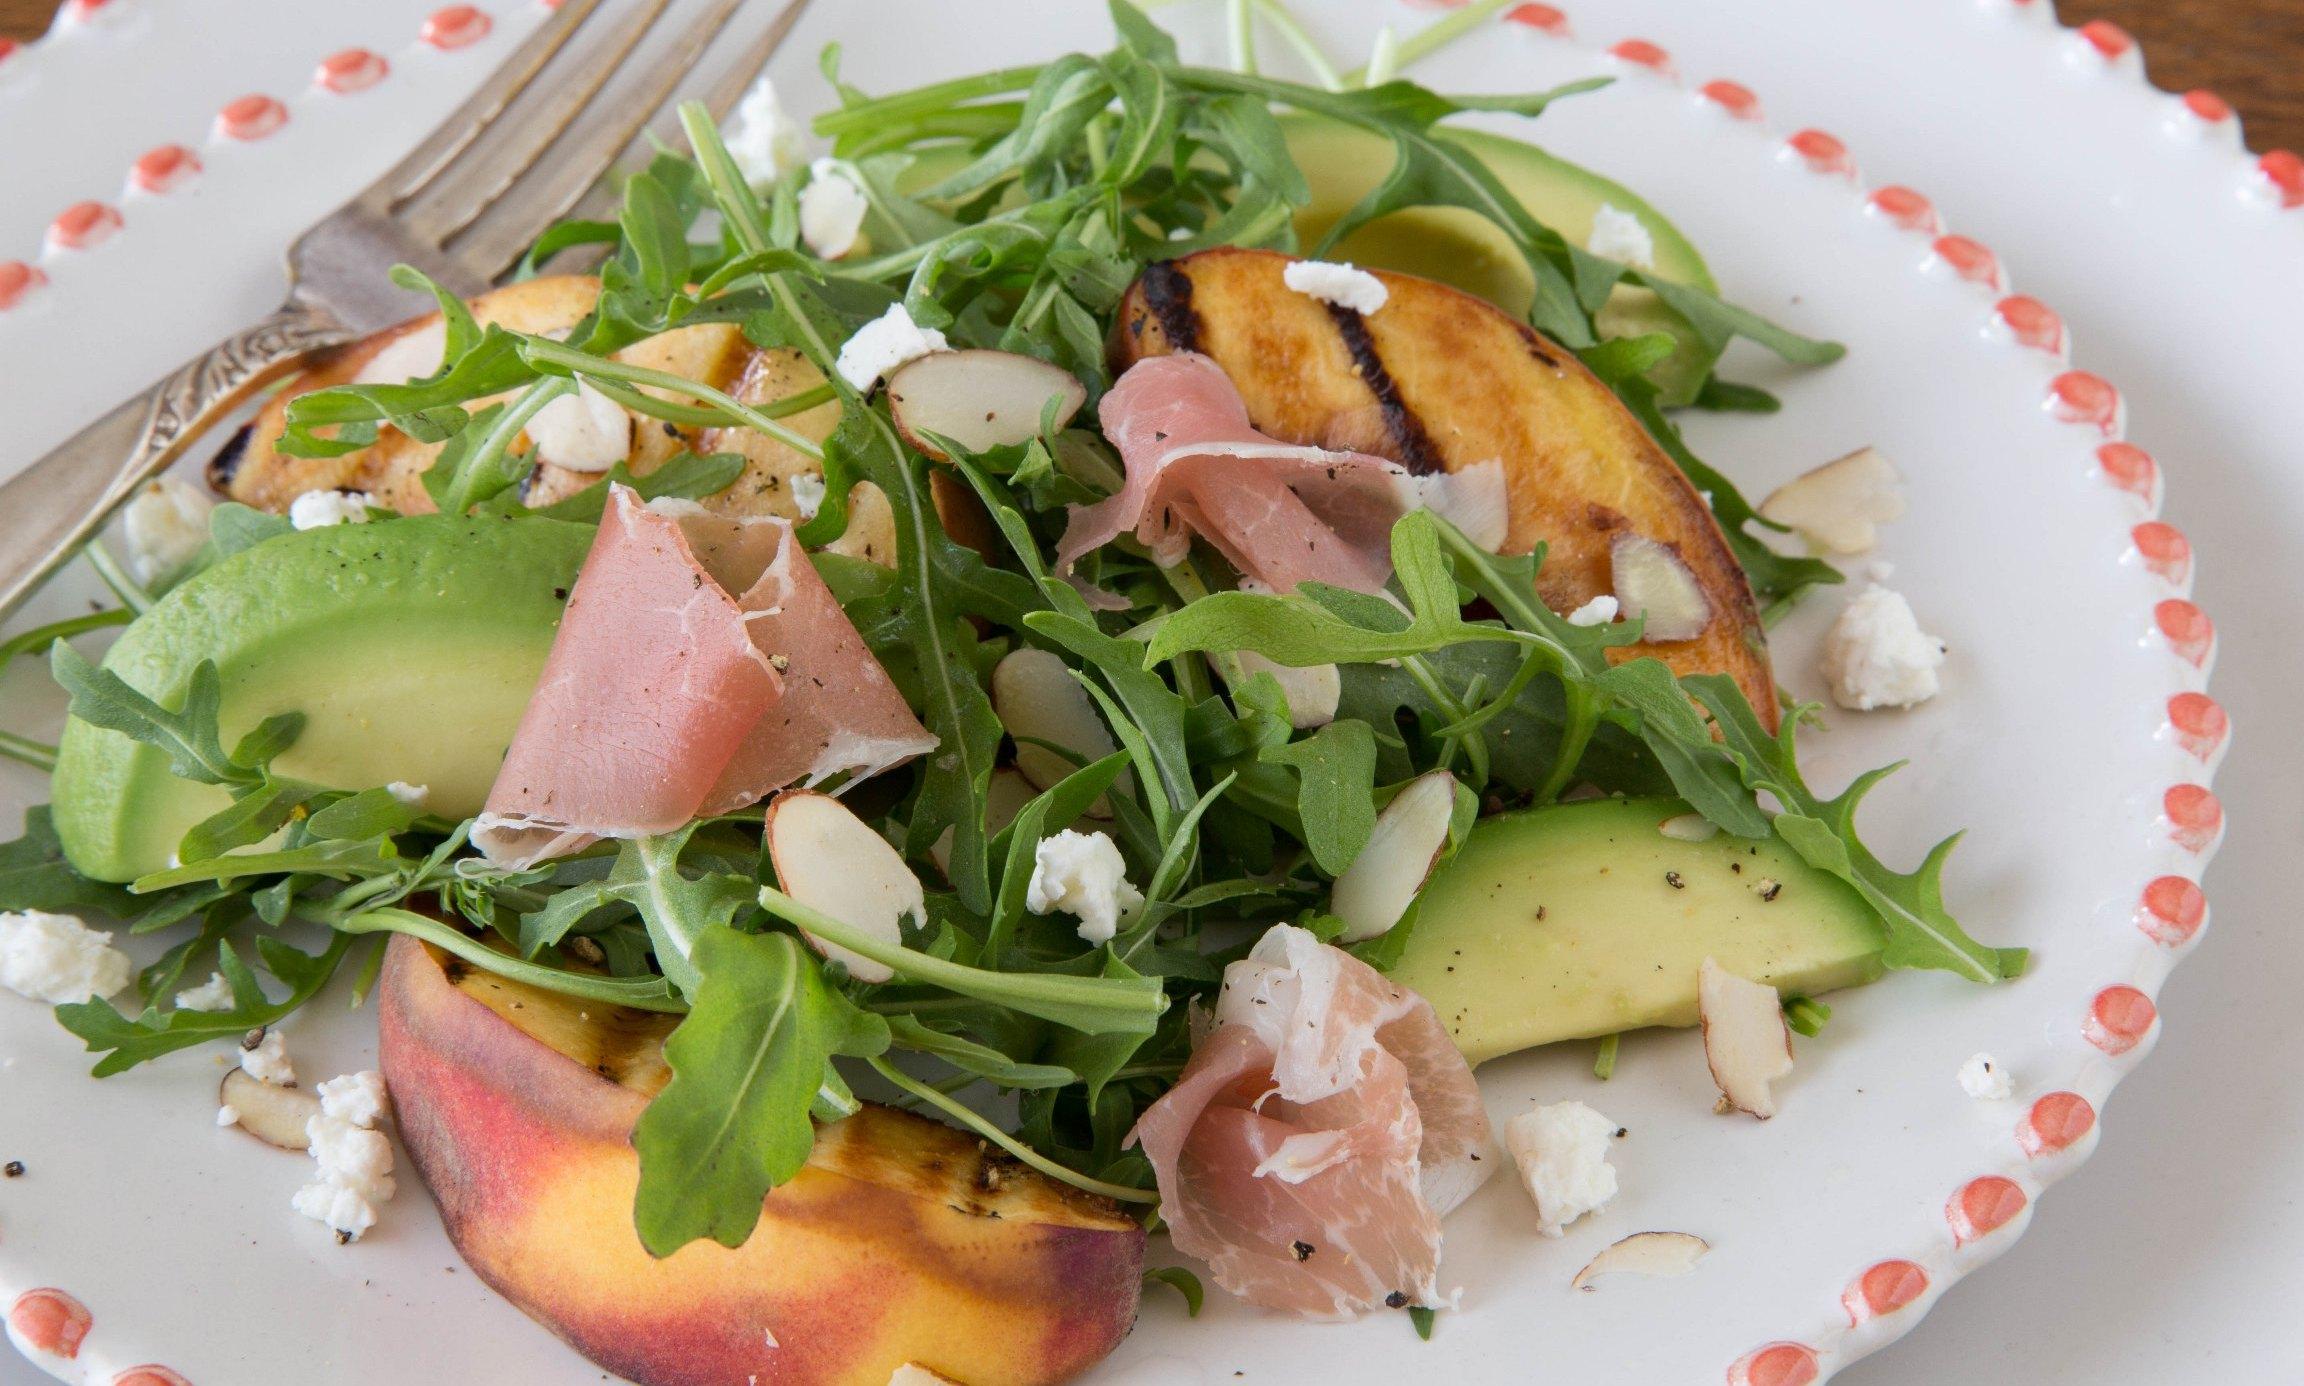 Grilled Peach & Arugula Salad with Mustard Herb Vinaigrette